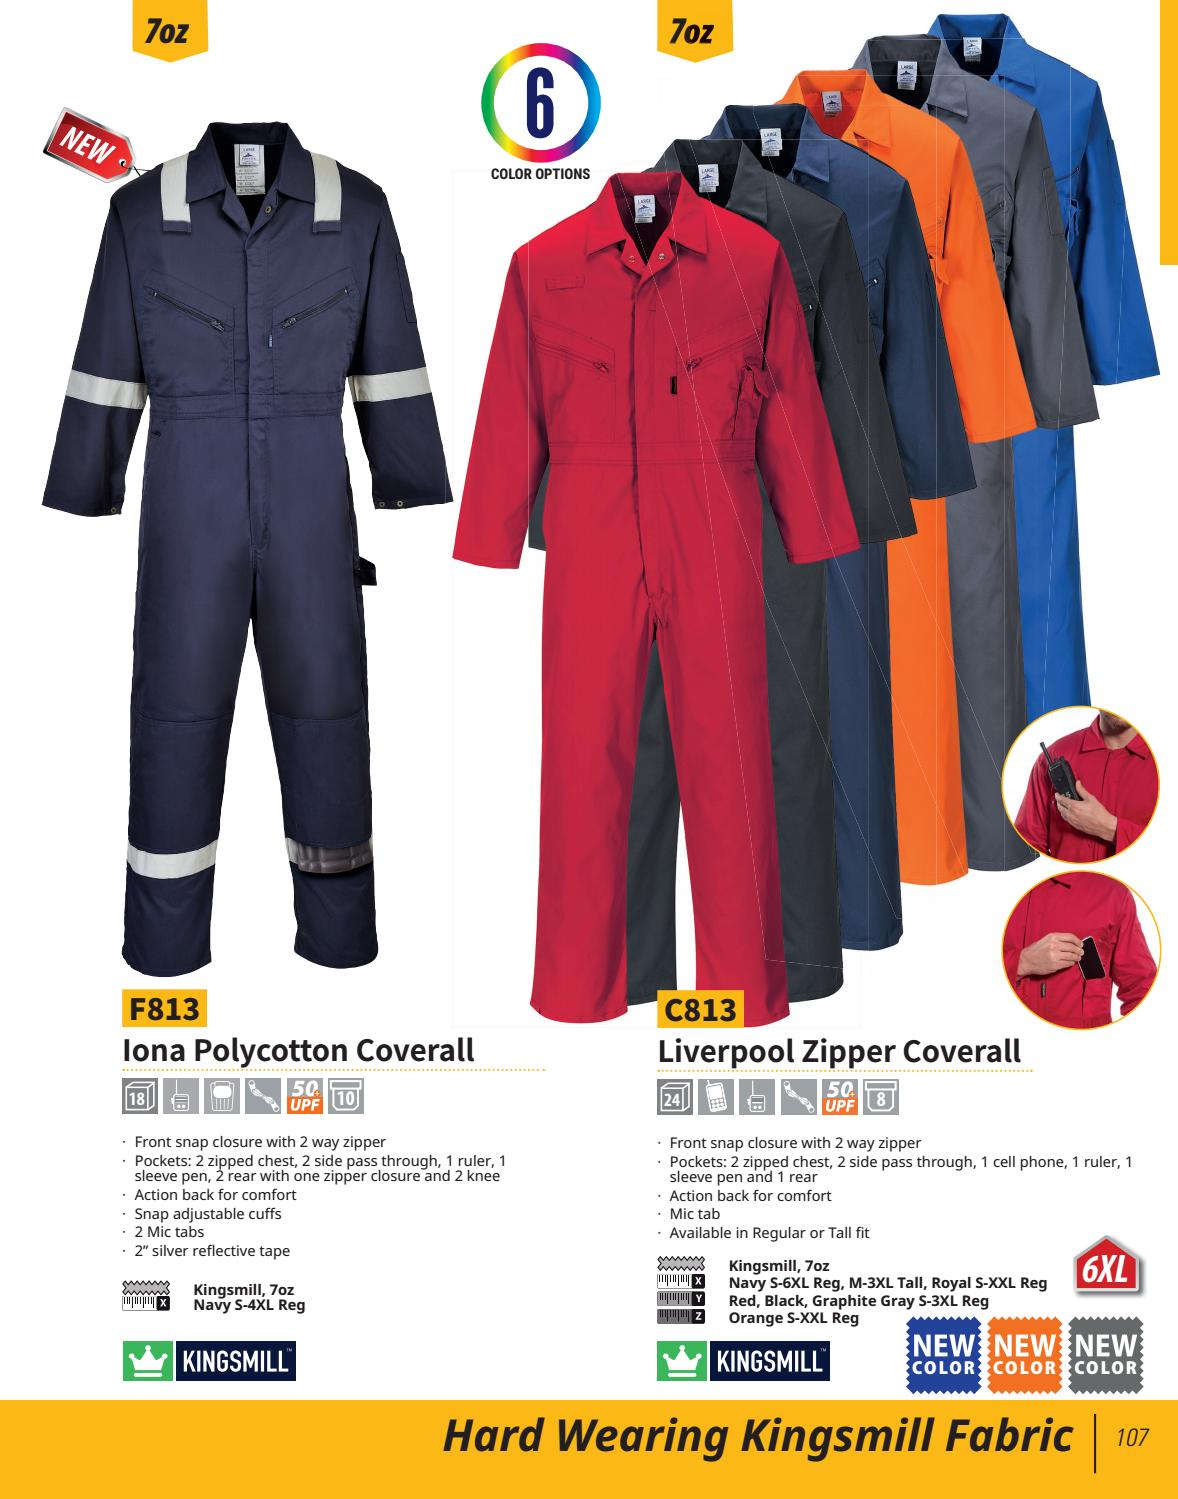 Portwest C813 Zipper Work Coveralls Regular /& Tall fit